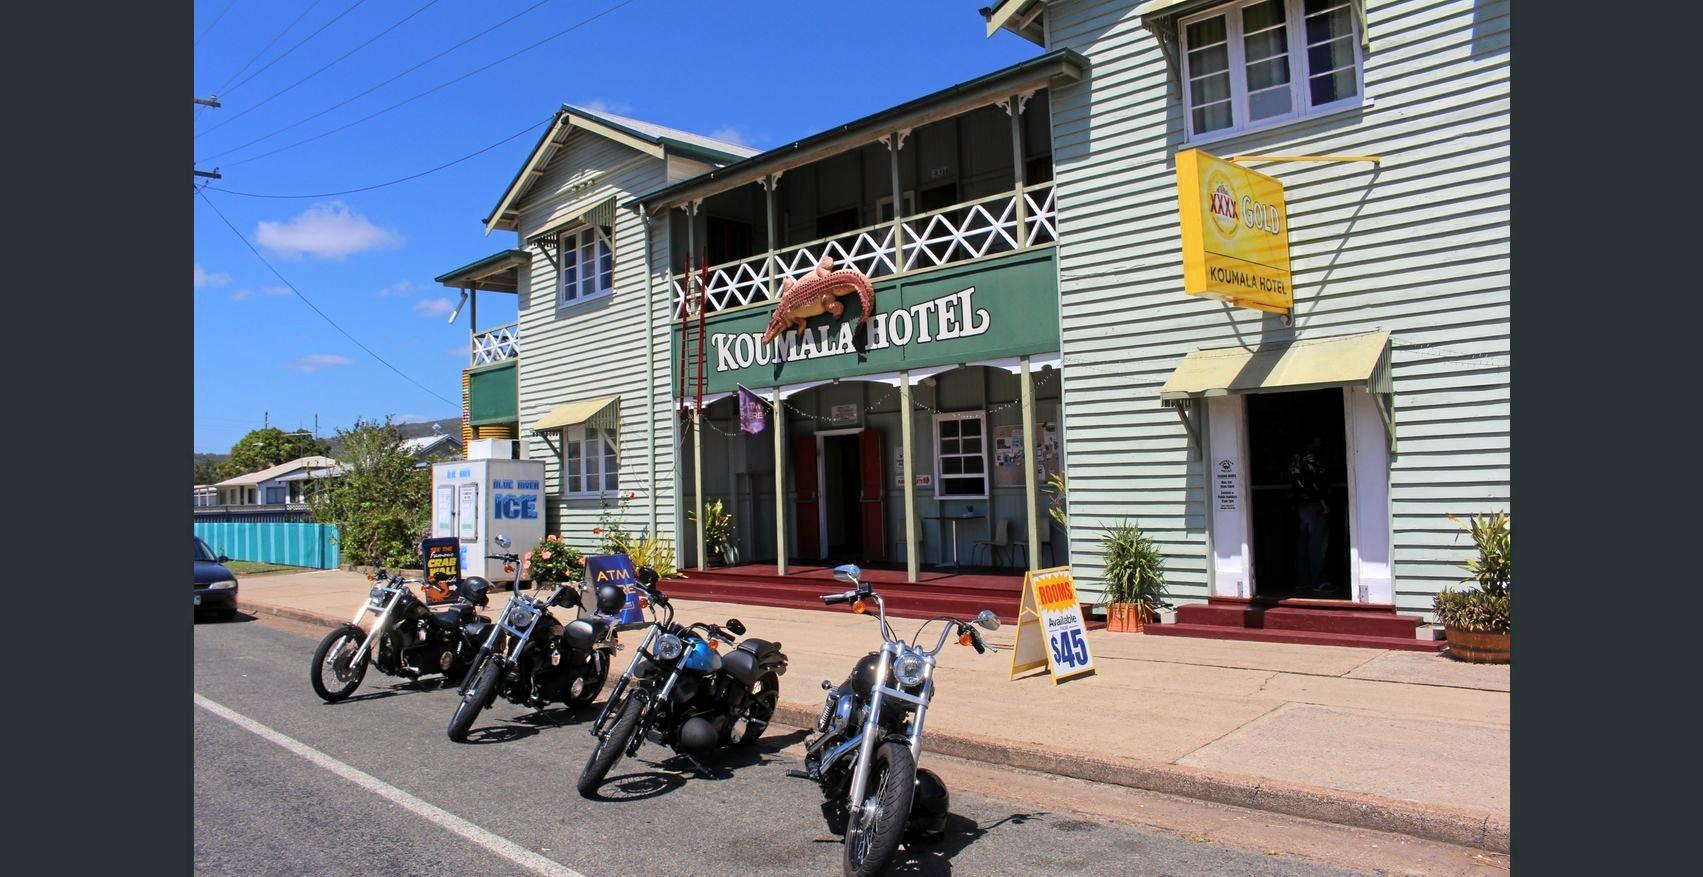 The Koumala Hotel is on the market for $1.25 million.